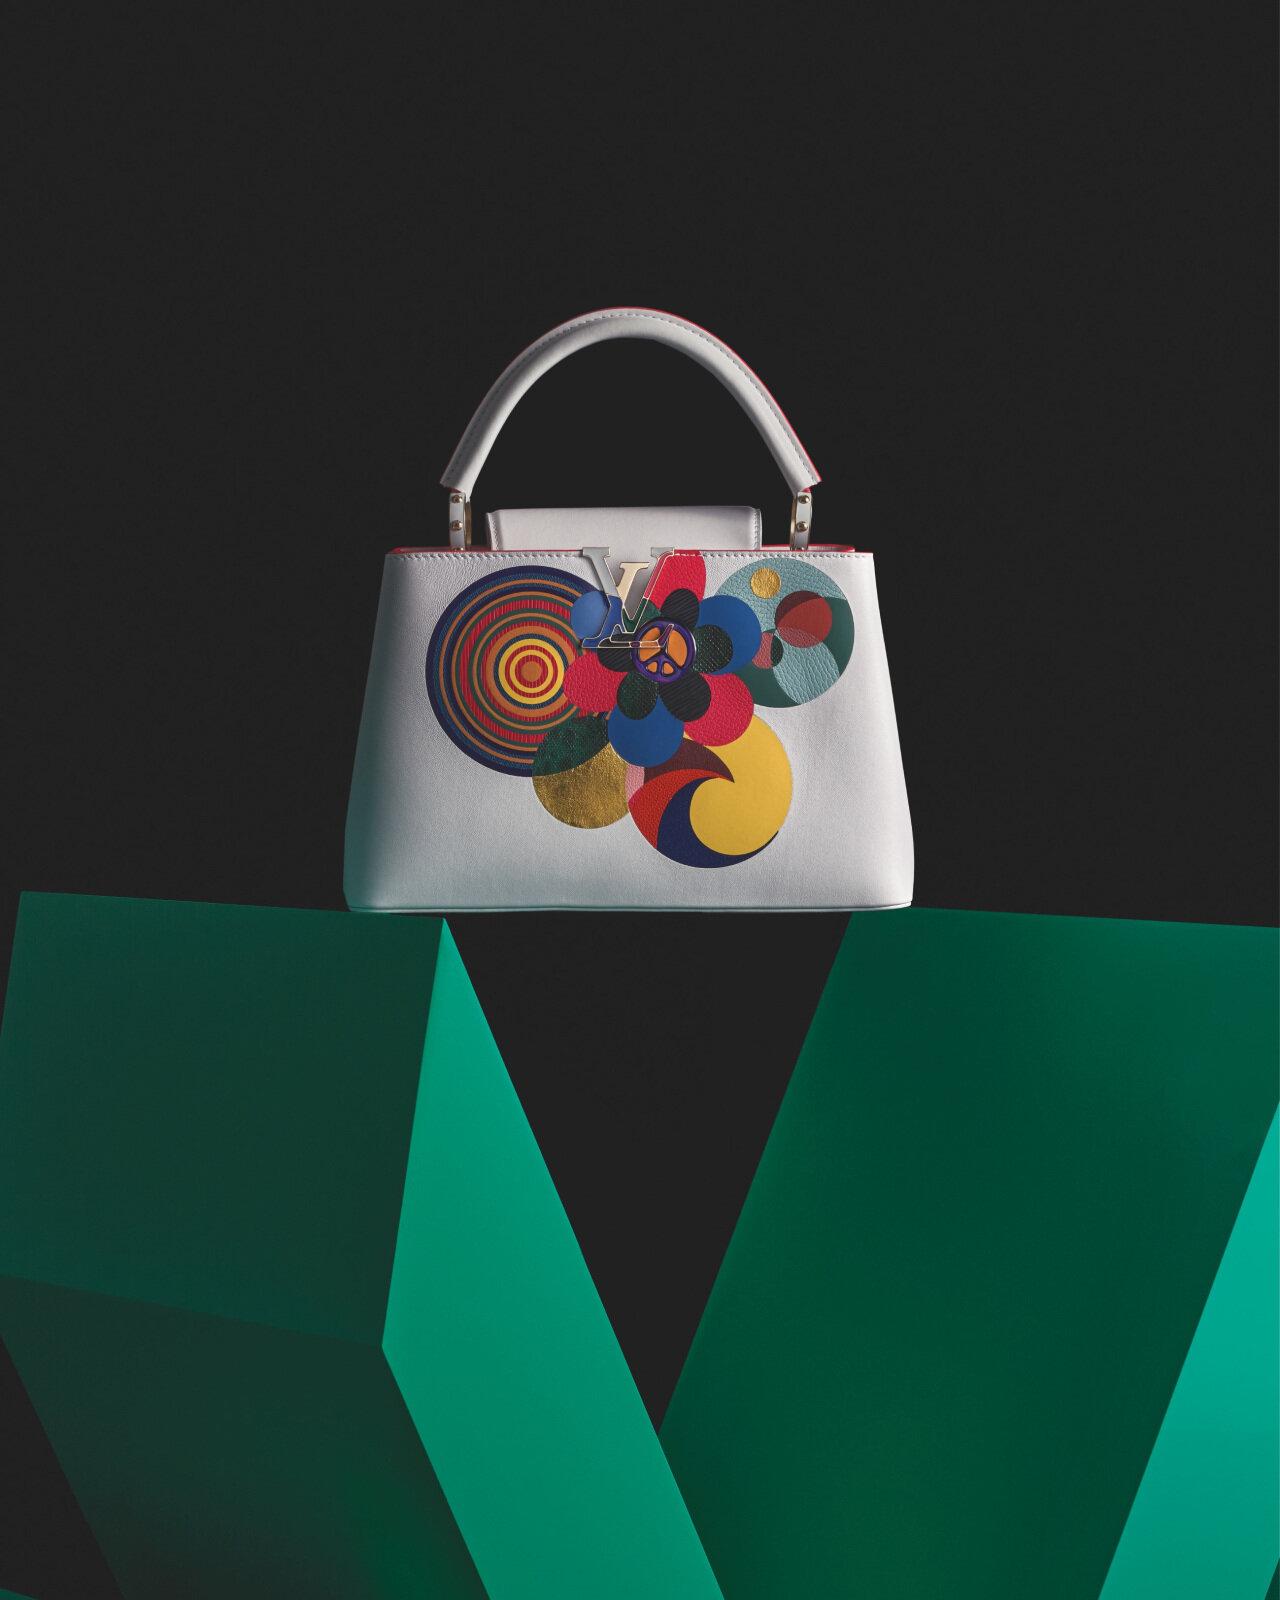 6 художників розмалювали сумки Louis Vuitton